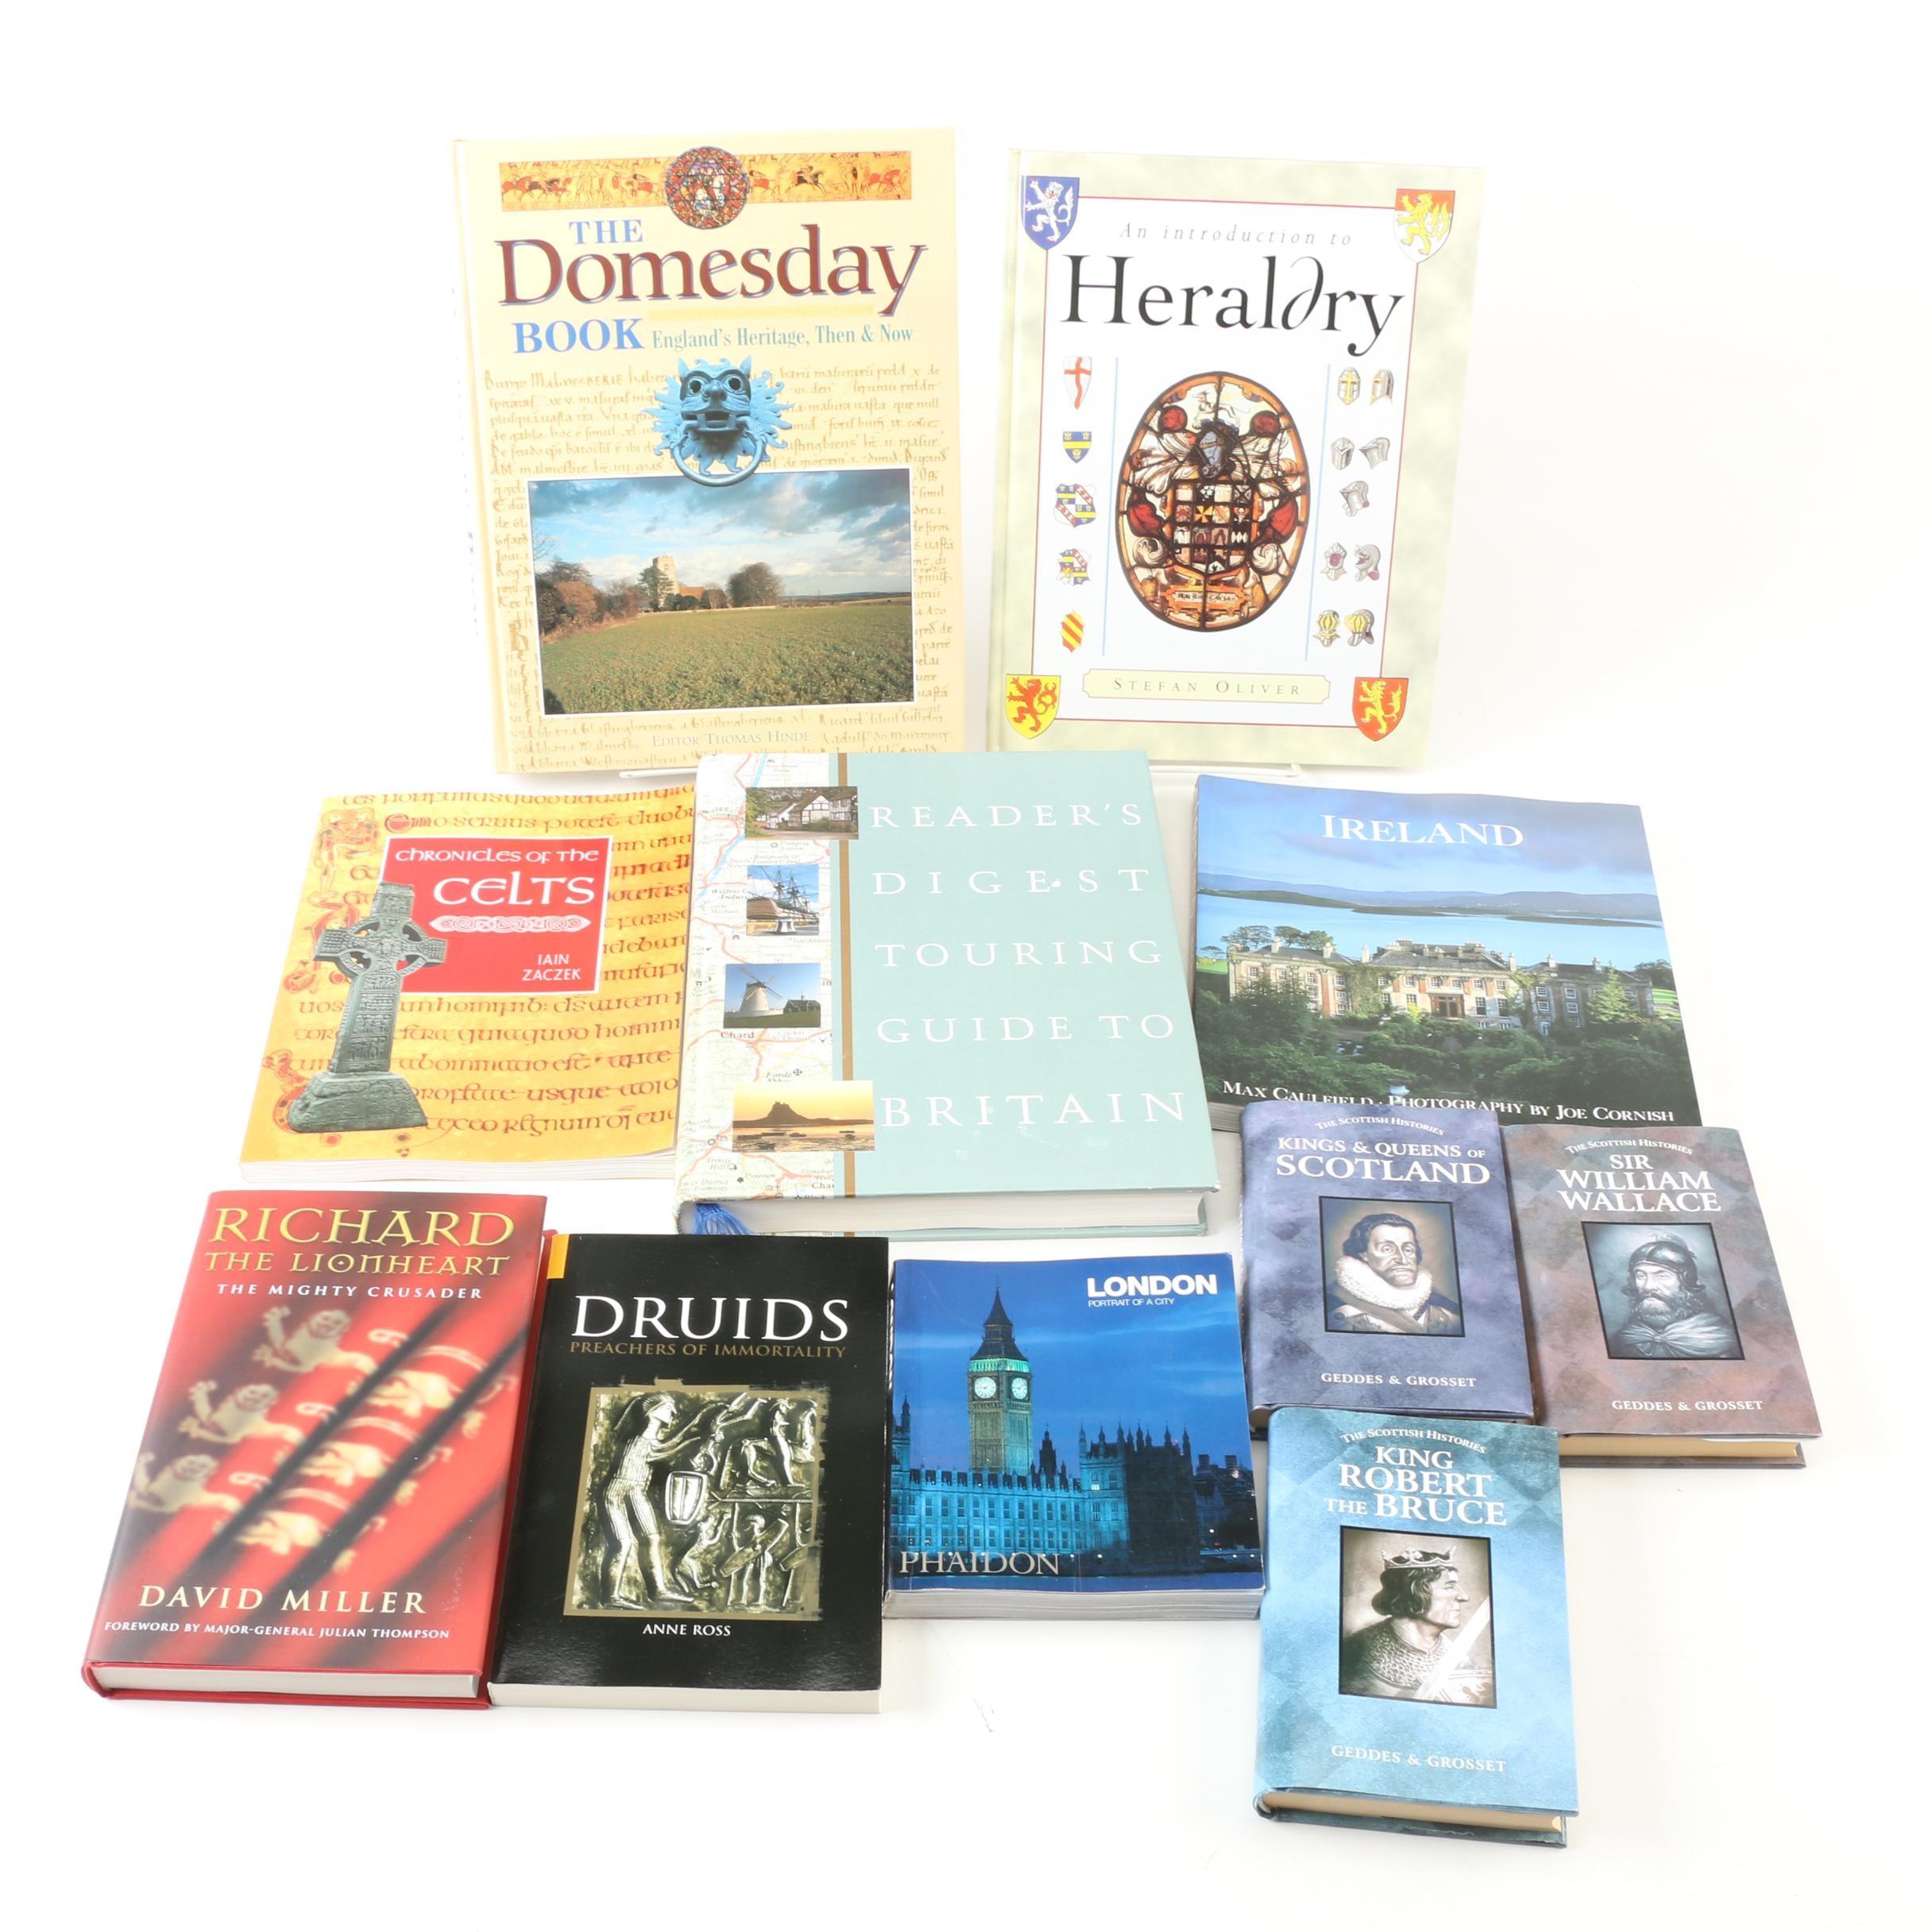 Books on Scotland, Ireland and England